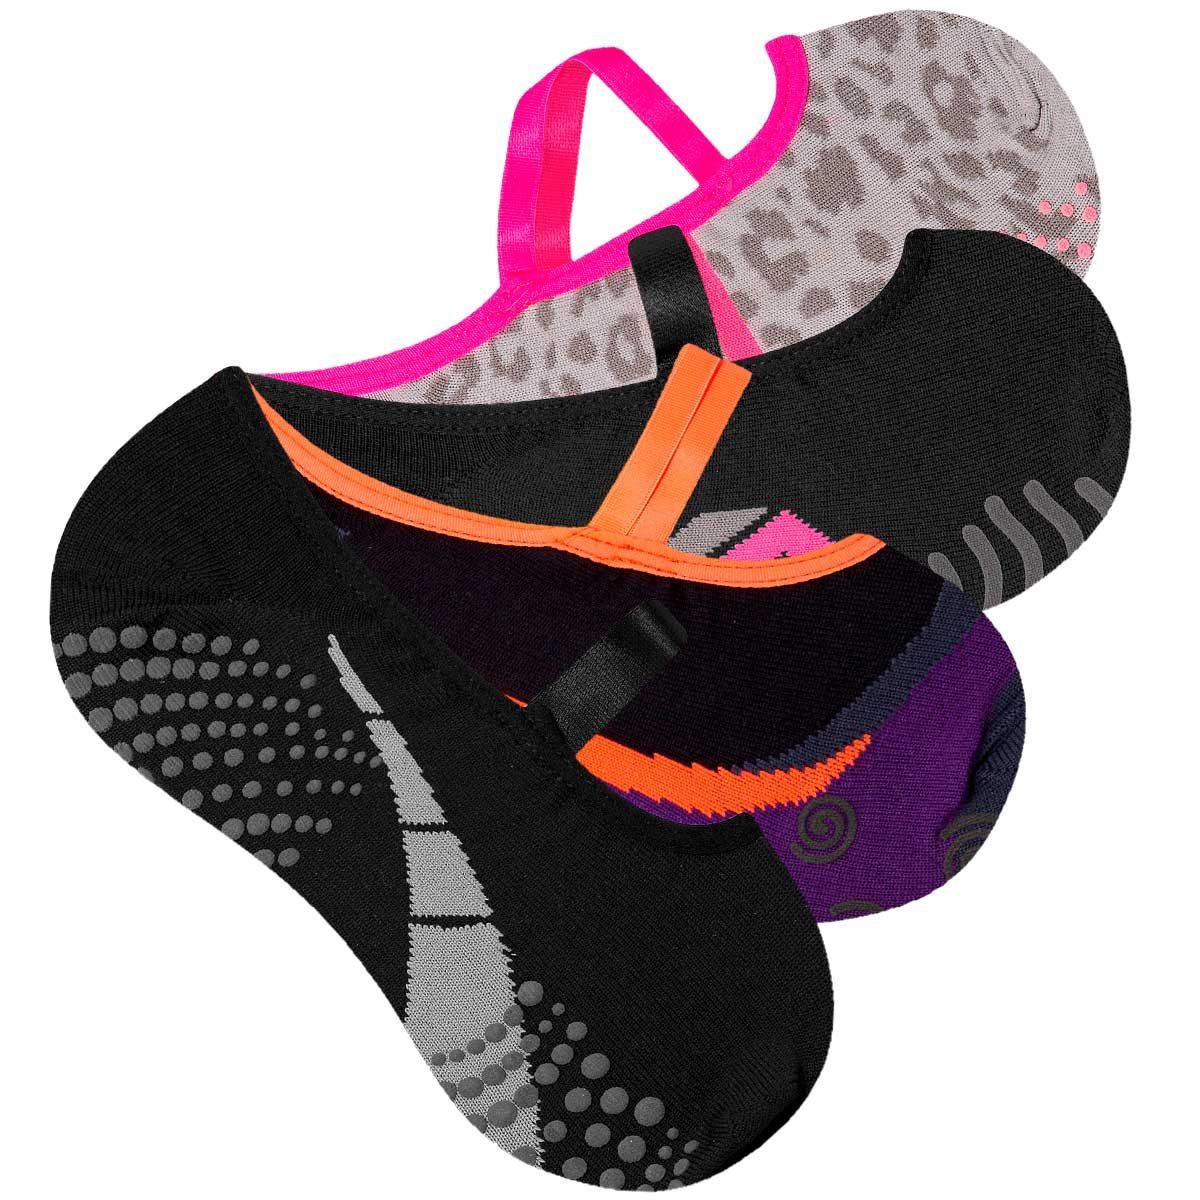 Kit 12 Pares de Meias Sapatilha Pilates Antiderrapante Feminina Yoga